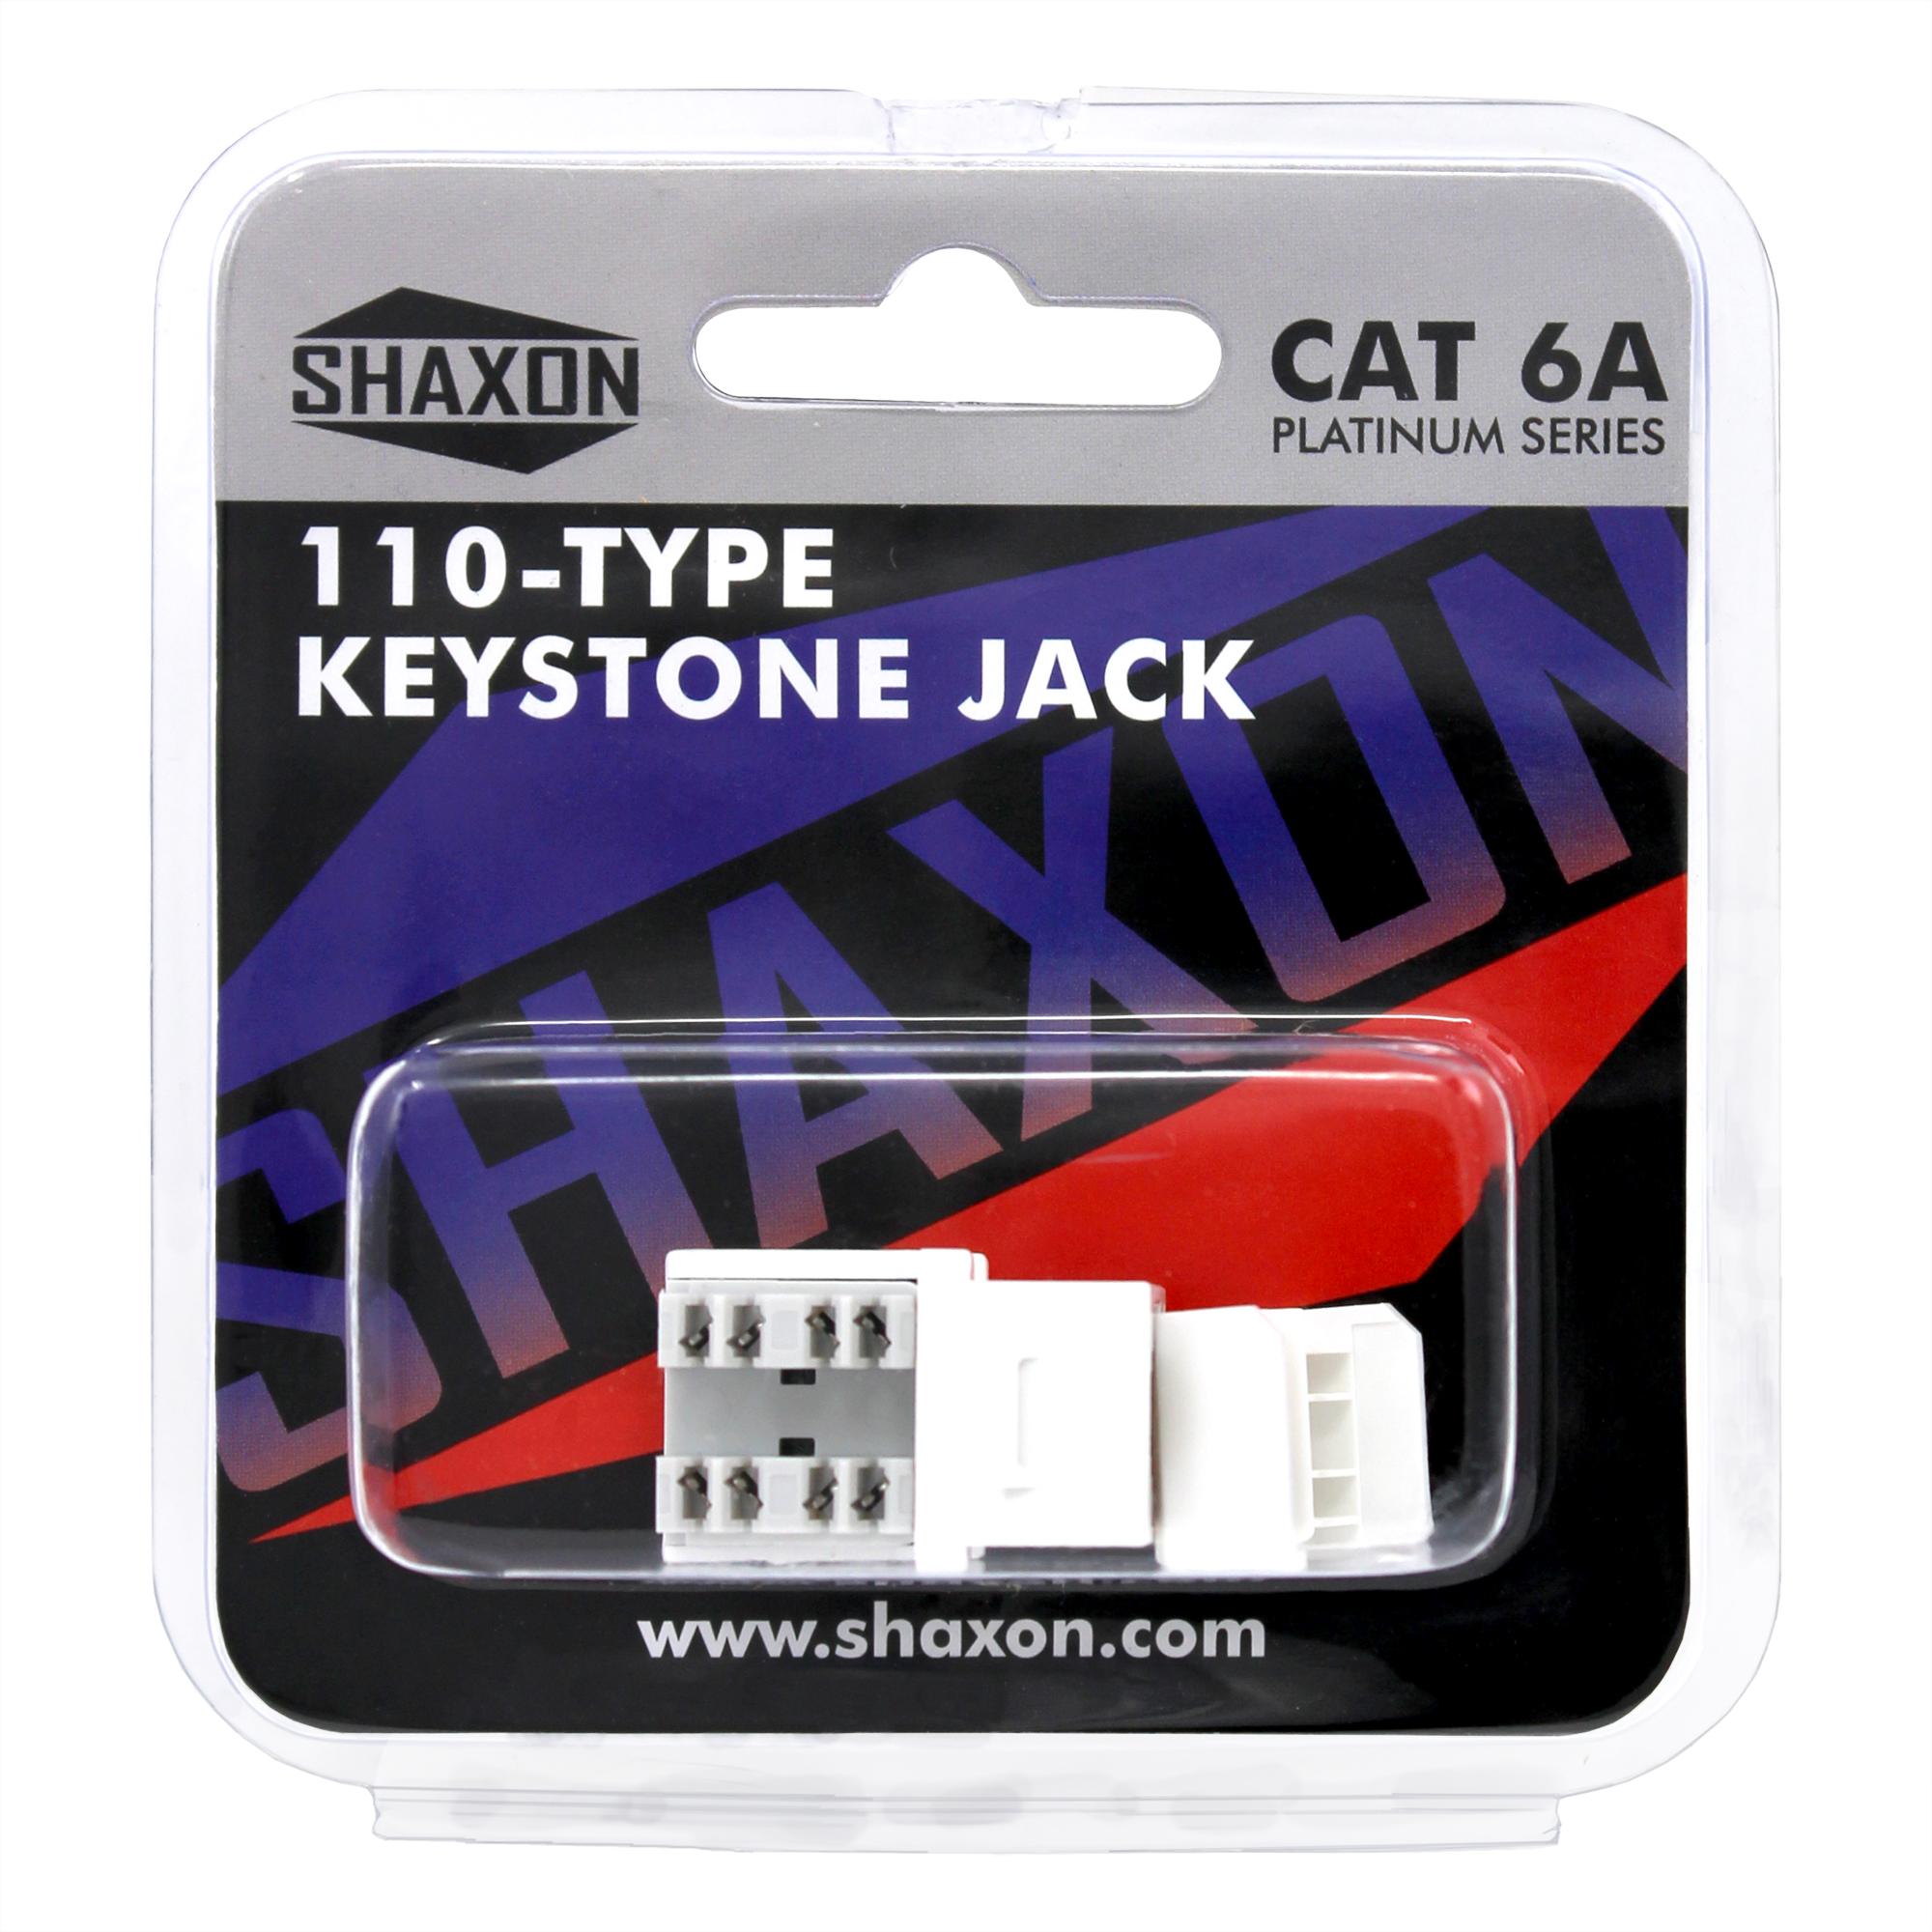 Rj45 Phone Jack Wiring 568a Spec Electrical Diagrams Diagram For Wall Socket Cat6a Keystone B White Shaxon Consumer Electronics 568b